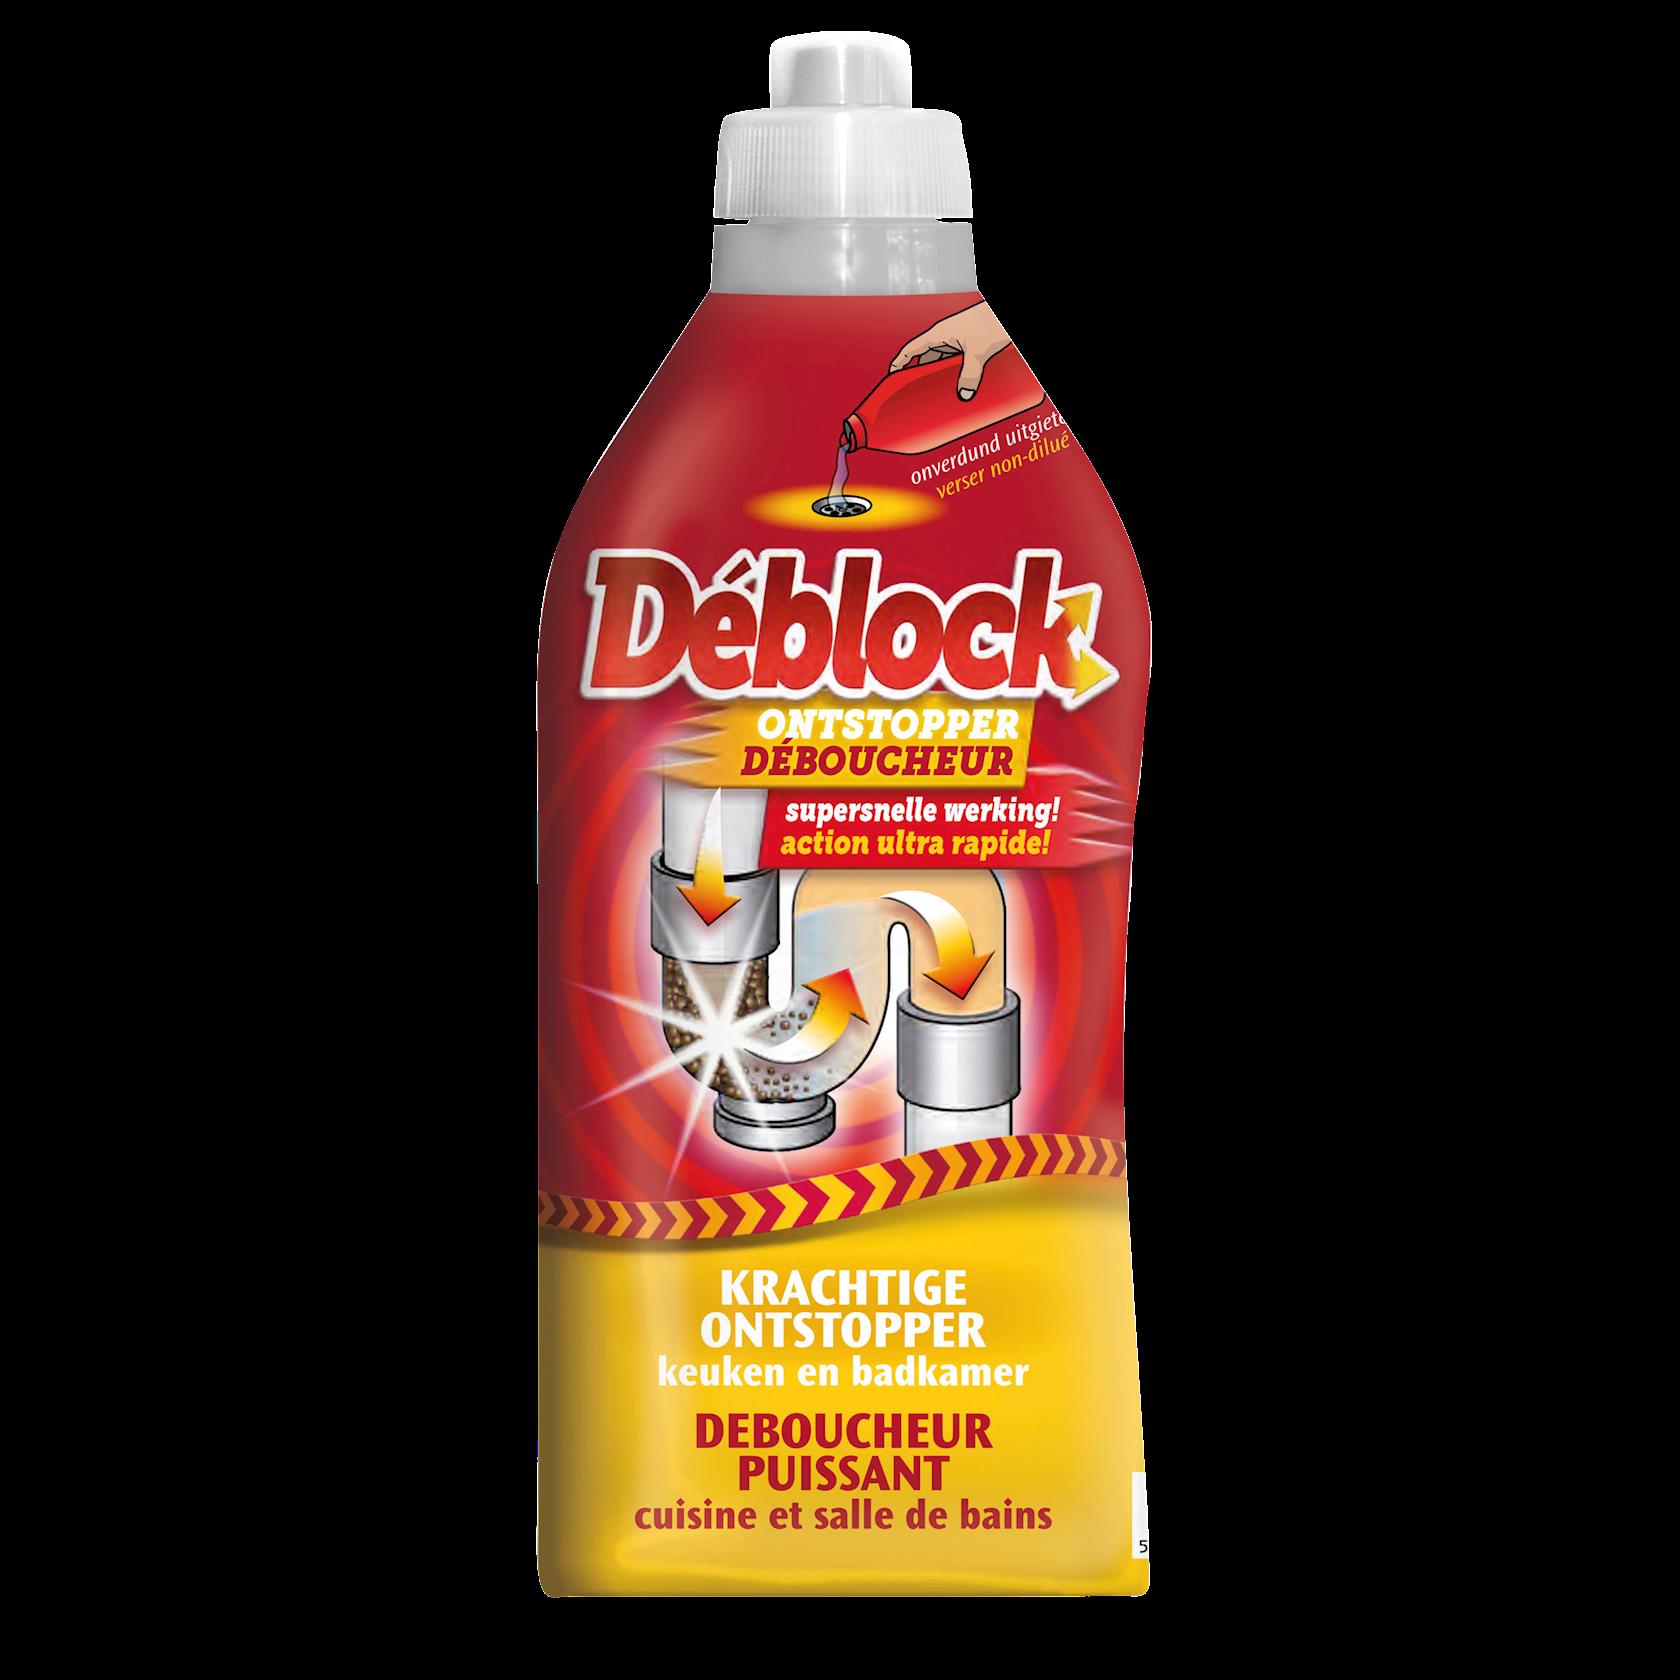 Deblock krachtige ontstopper 1 L - lost vuil op in de keuken en badkamer